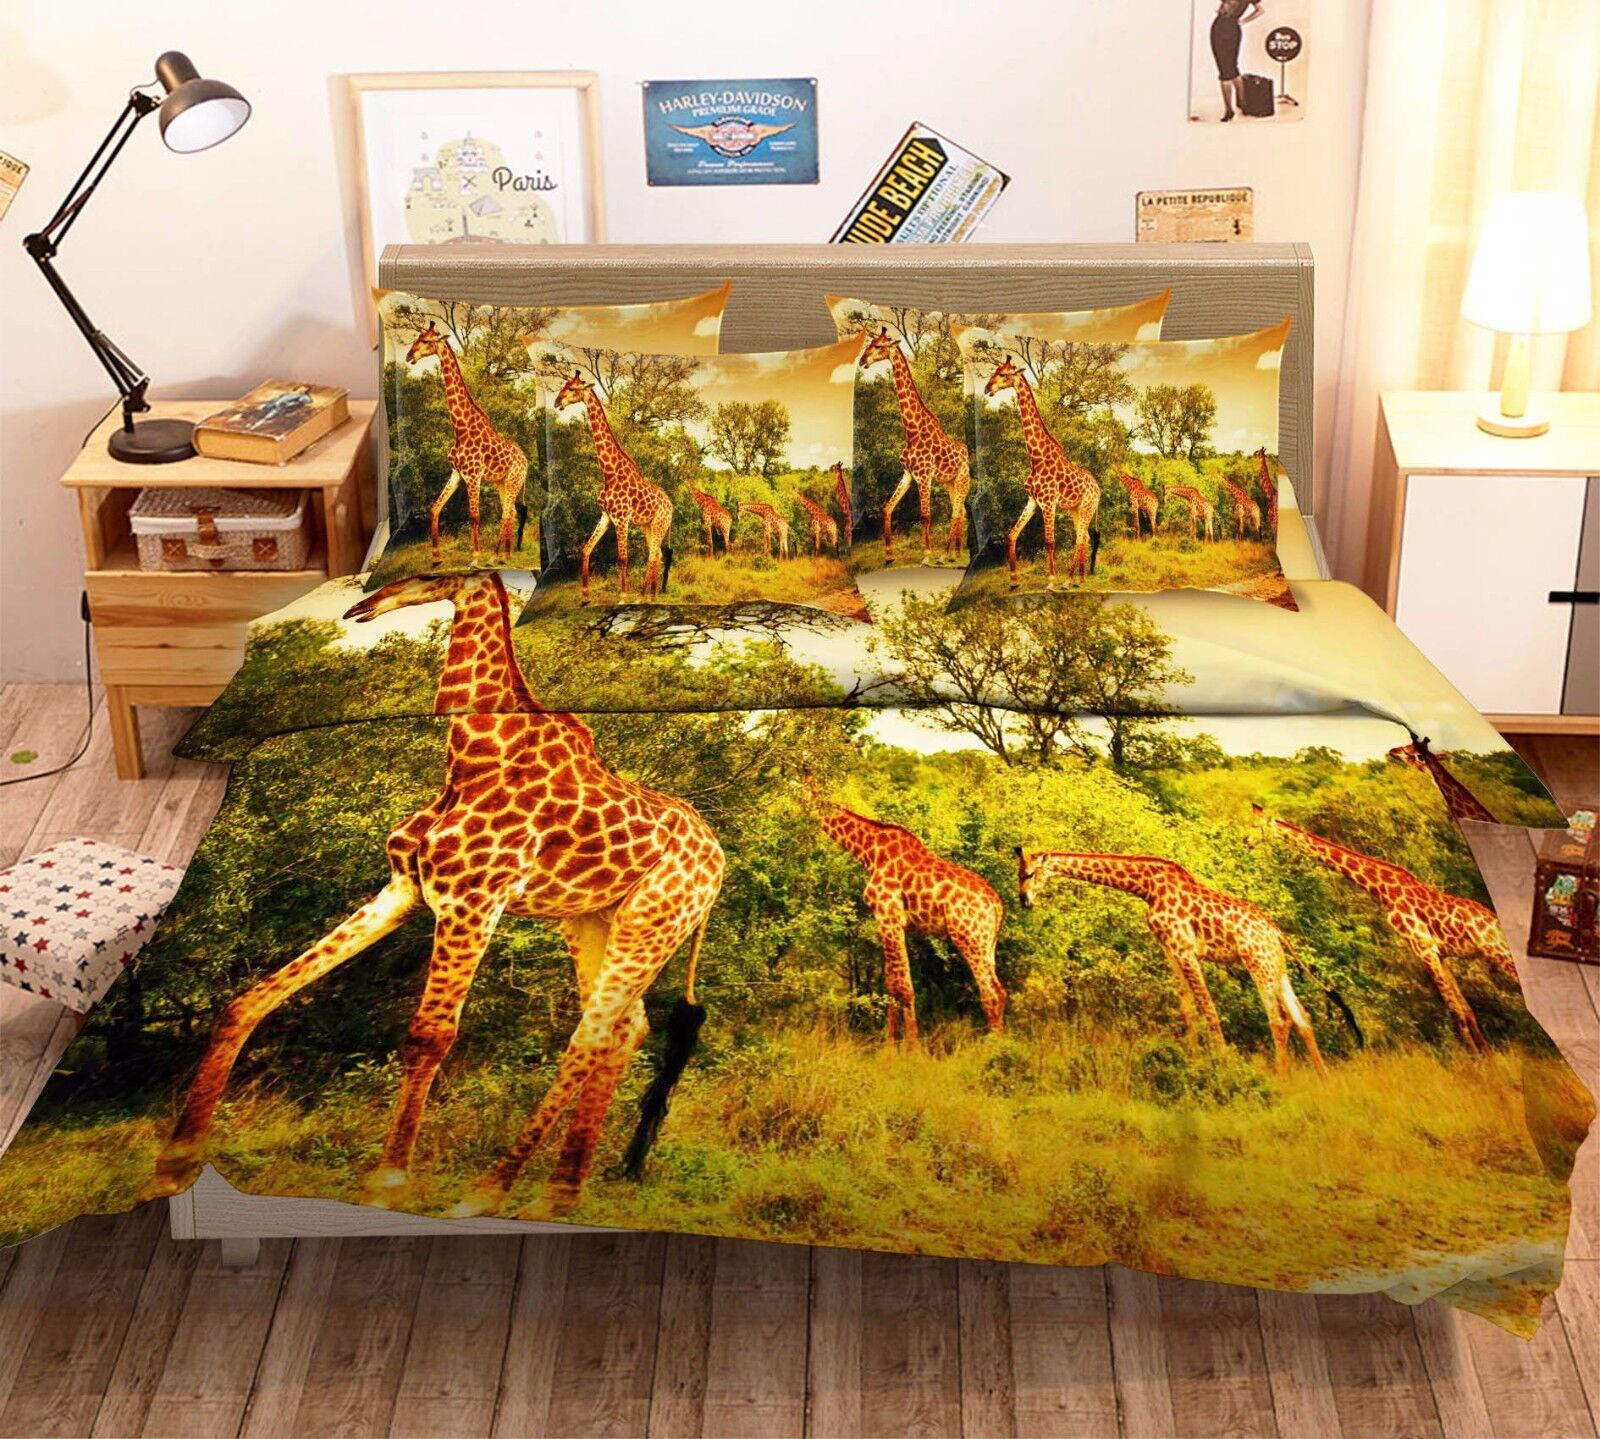 3D Lawn Giraffe 886 Bett Pillowcases Quilt Duvet Startseite Set Single Königin UK Kyra